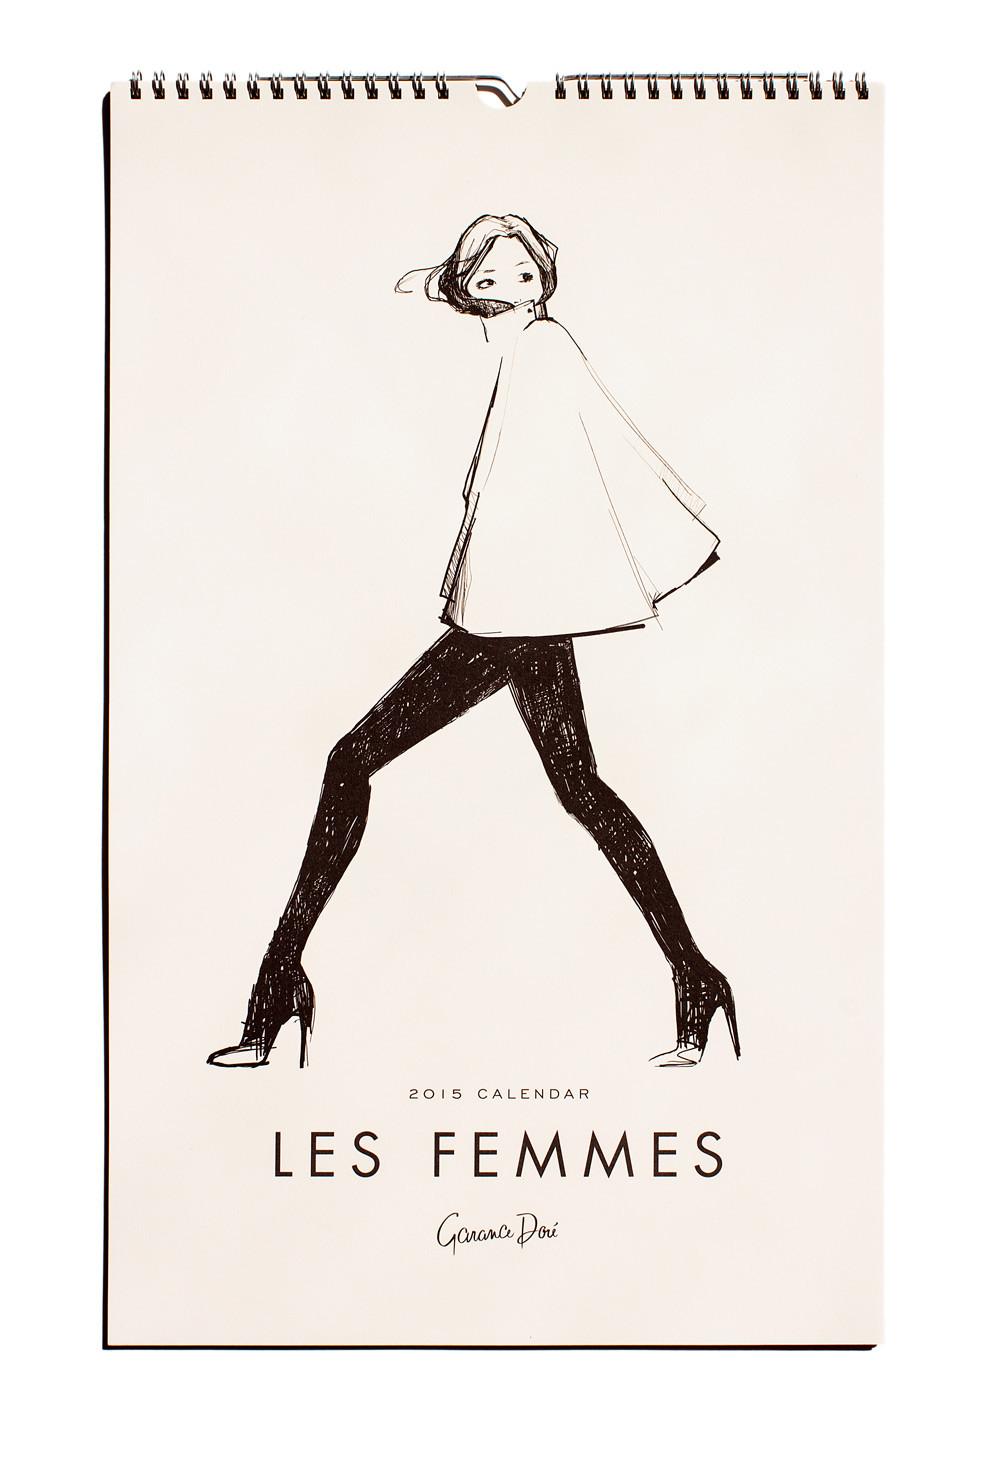 Les femmes calendar 2015 design Garance Doré